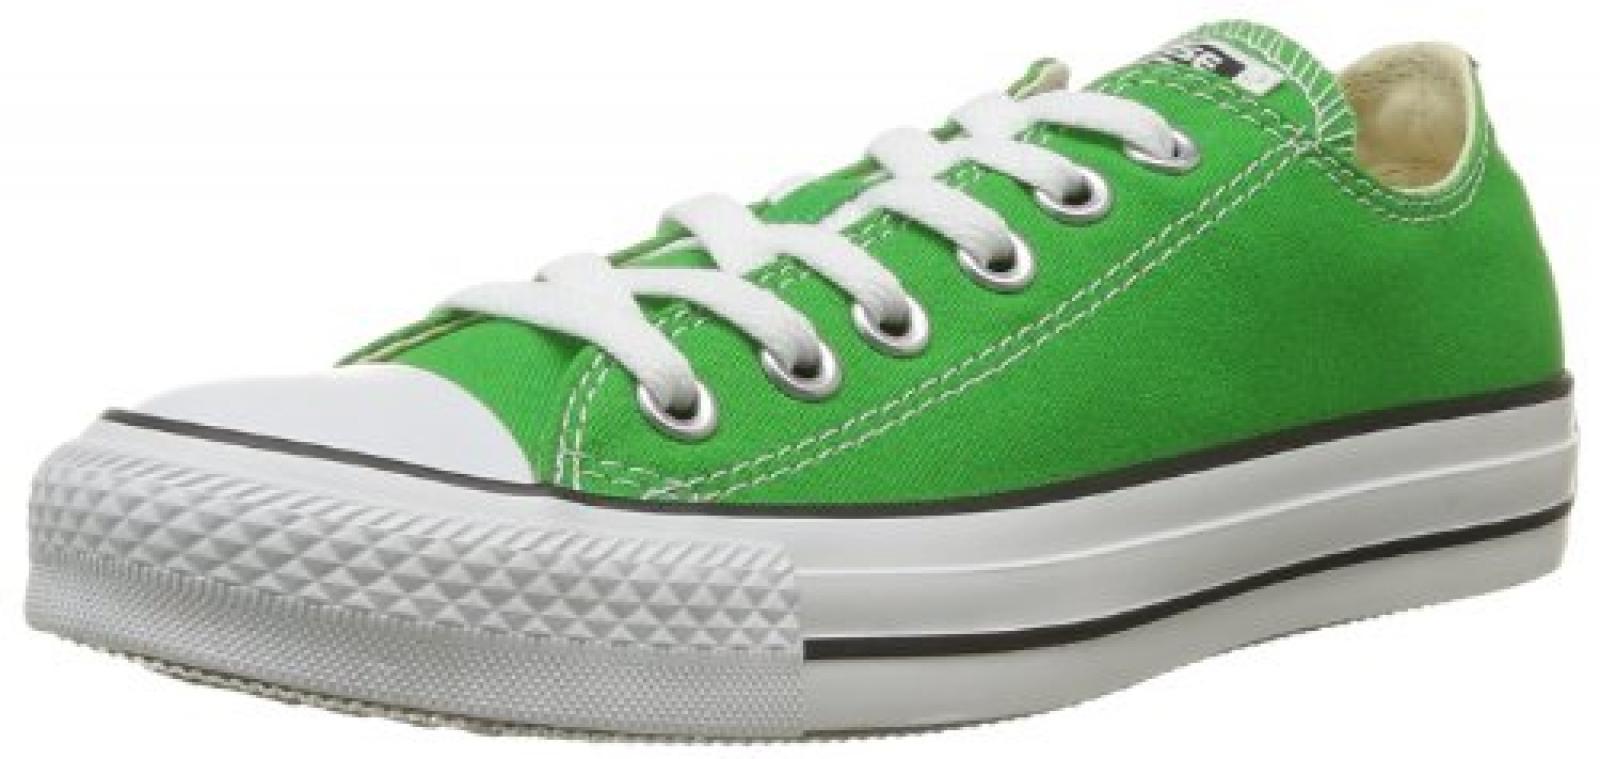 CONVERSE Chuck Taylor All Star Season Ox, Unisex - Kinder Sneaker